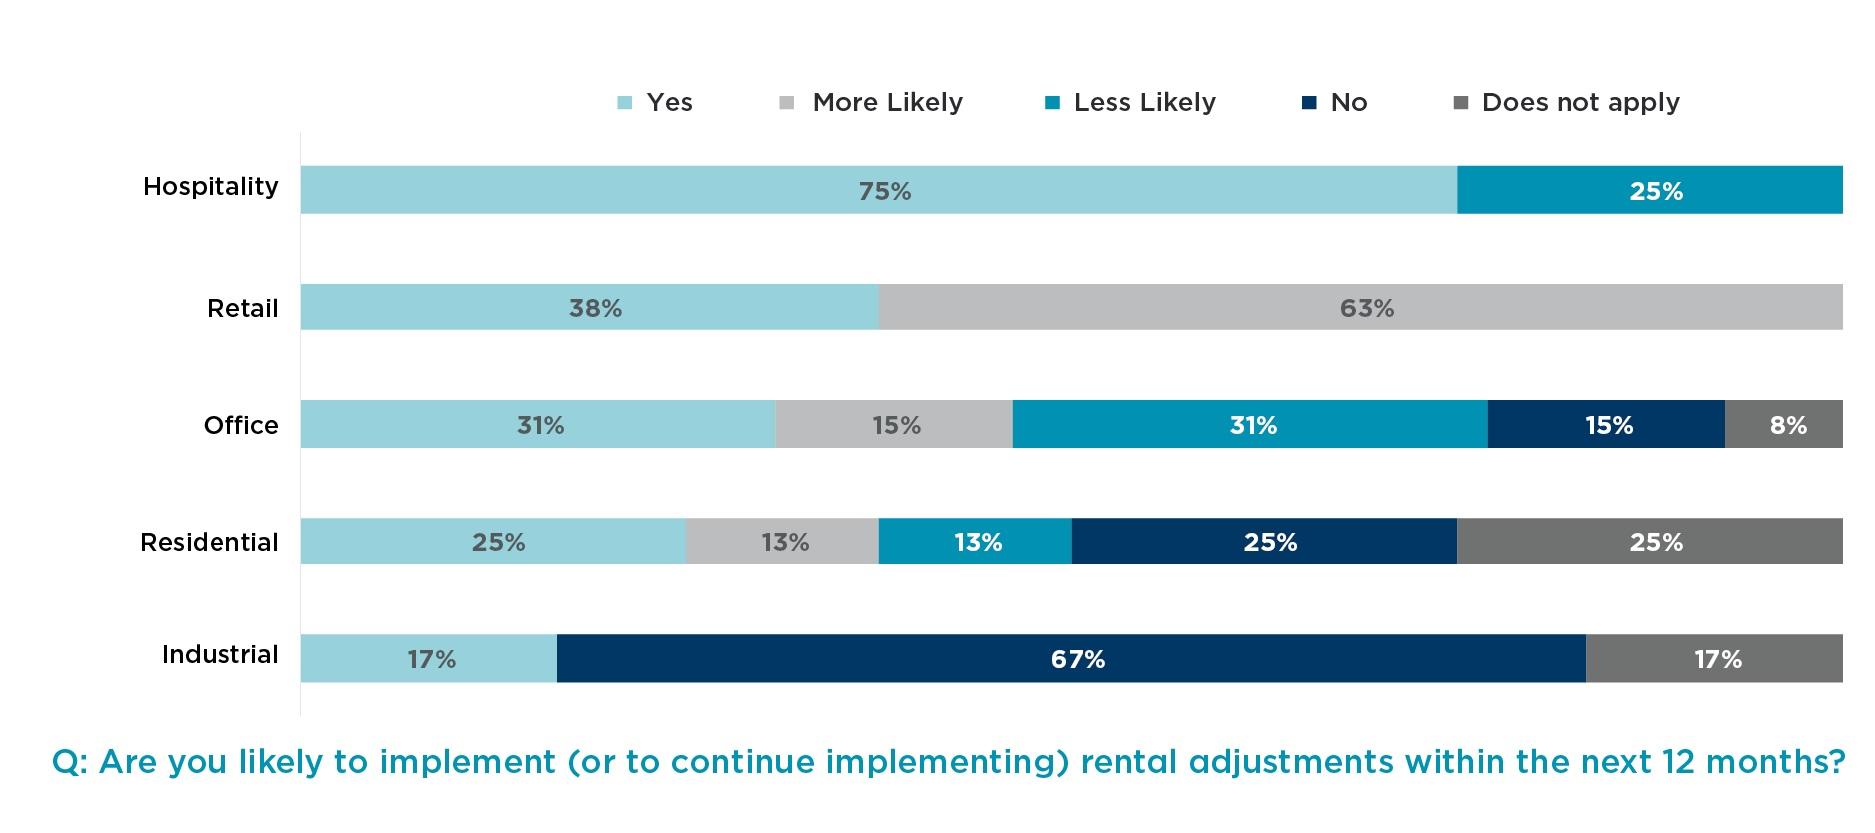 COVID-19 Real Estate Developer Sentiment Survey Second Edition